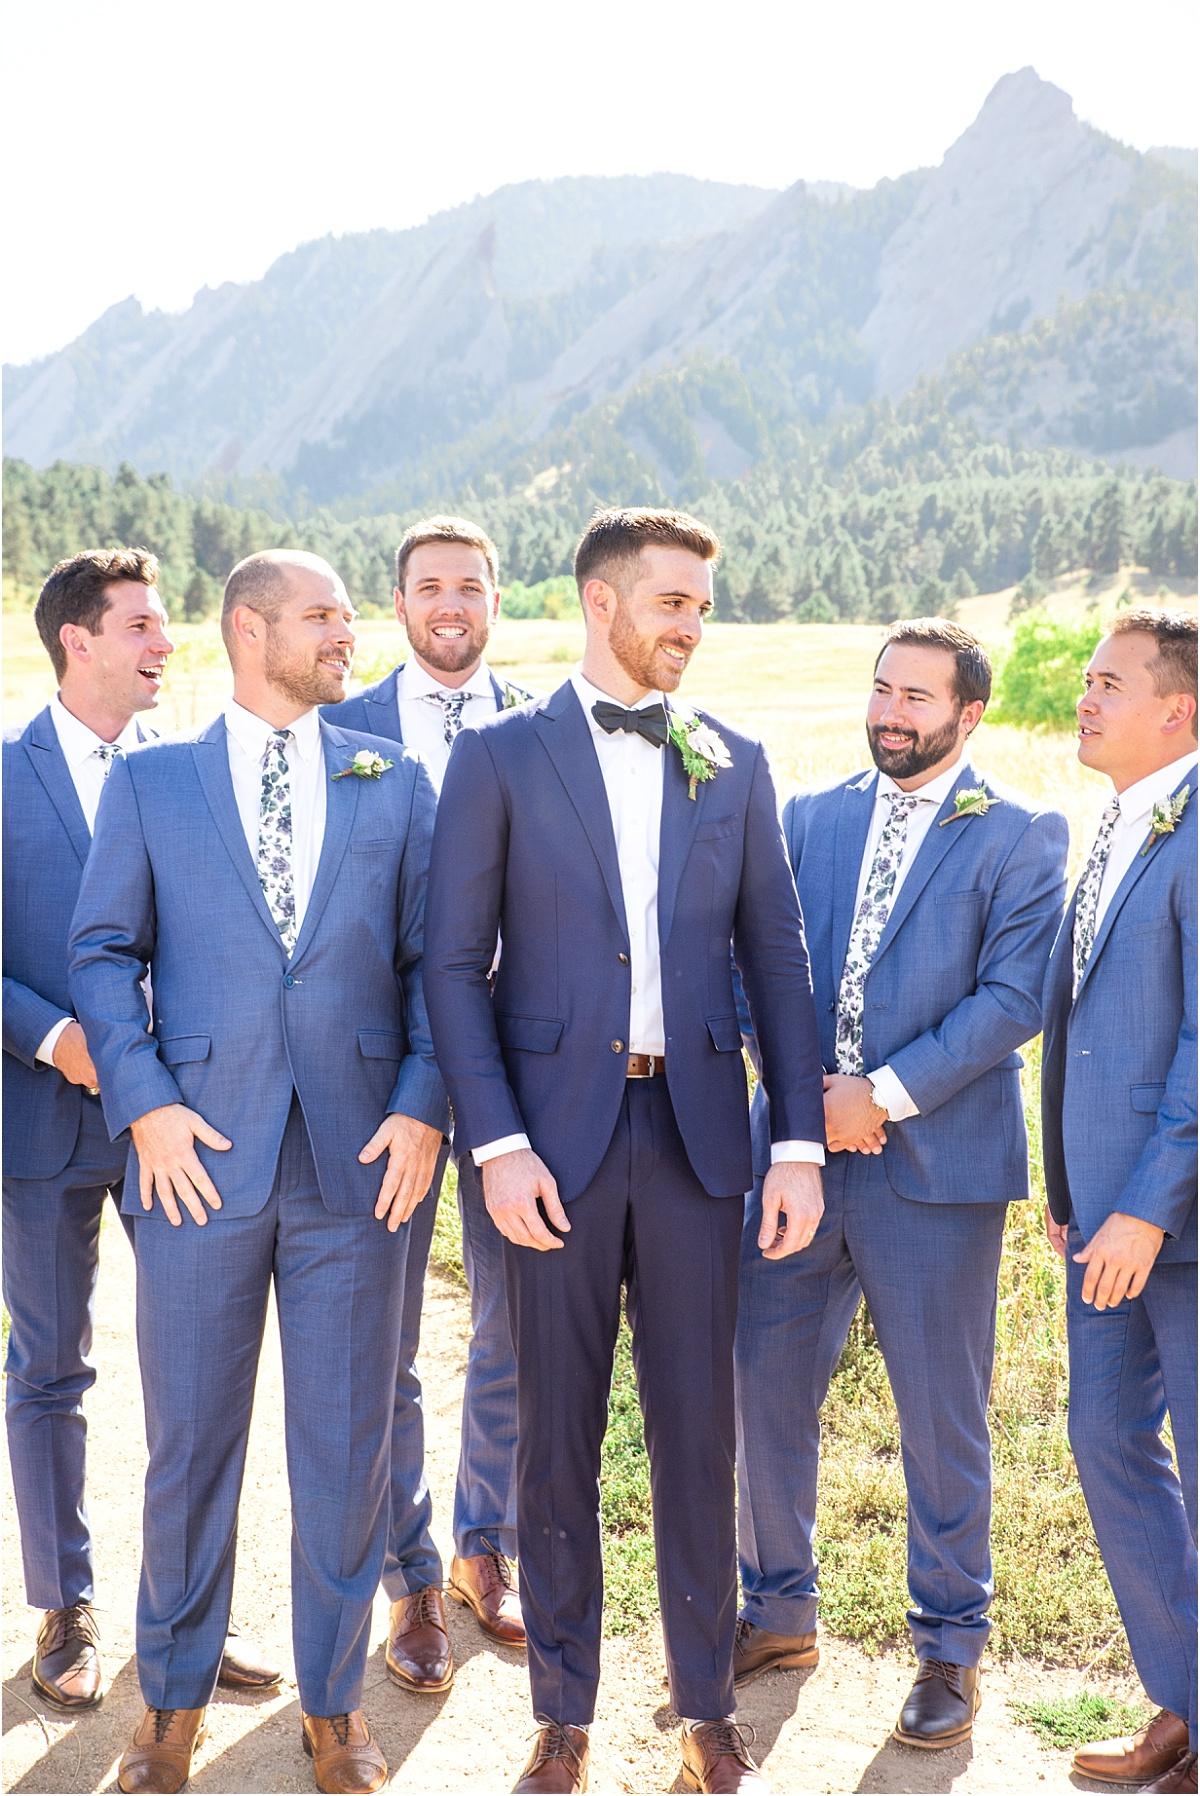 wedgewood-bouldercreek-wedding-boulder-w